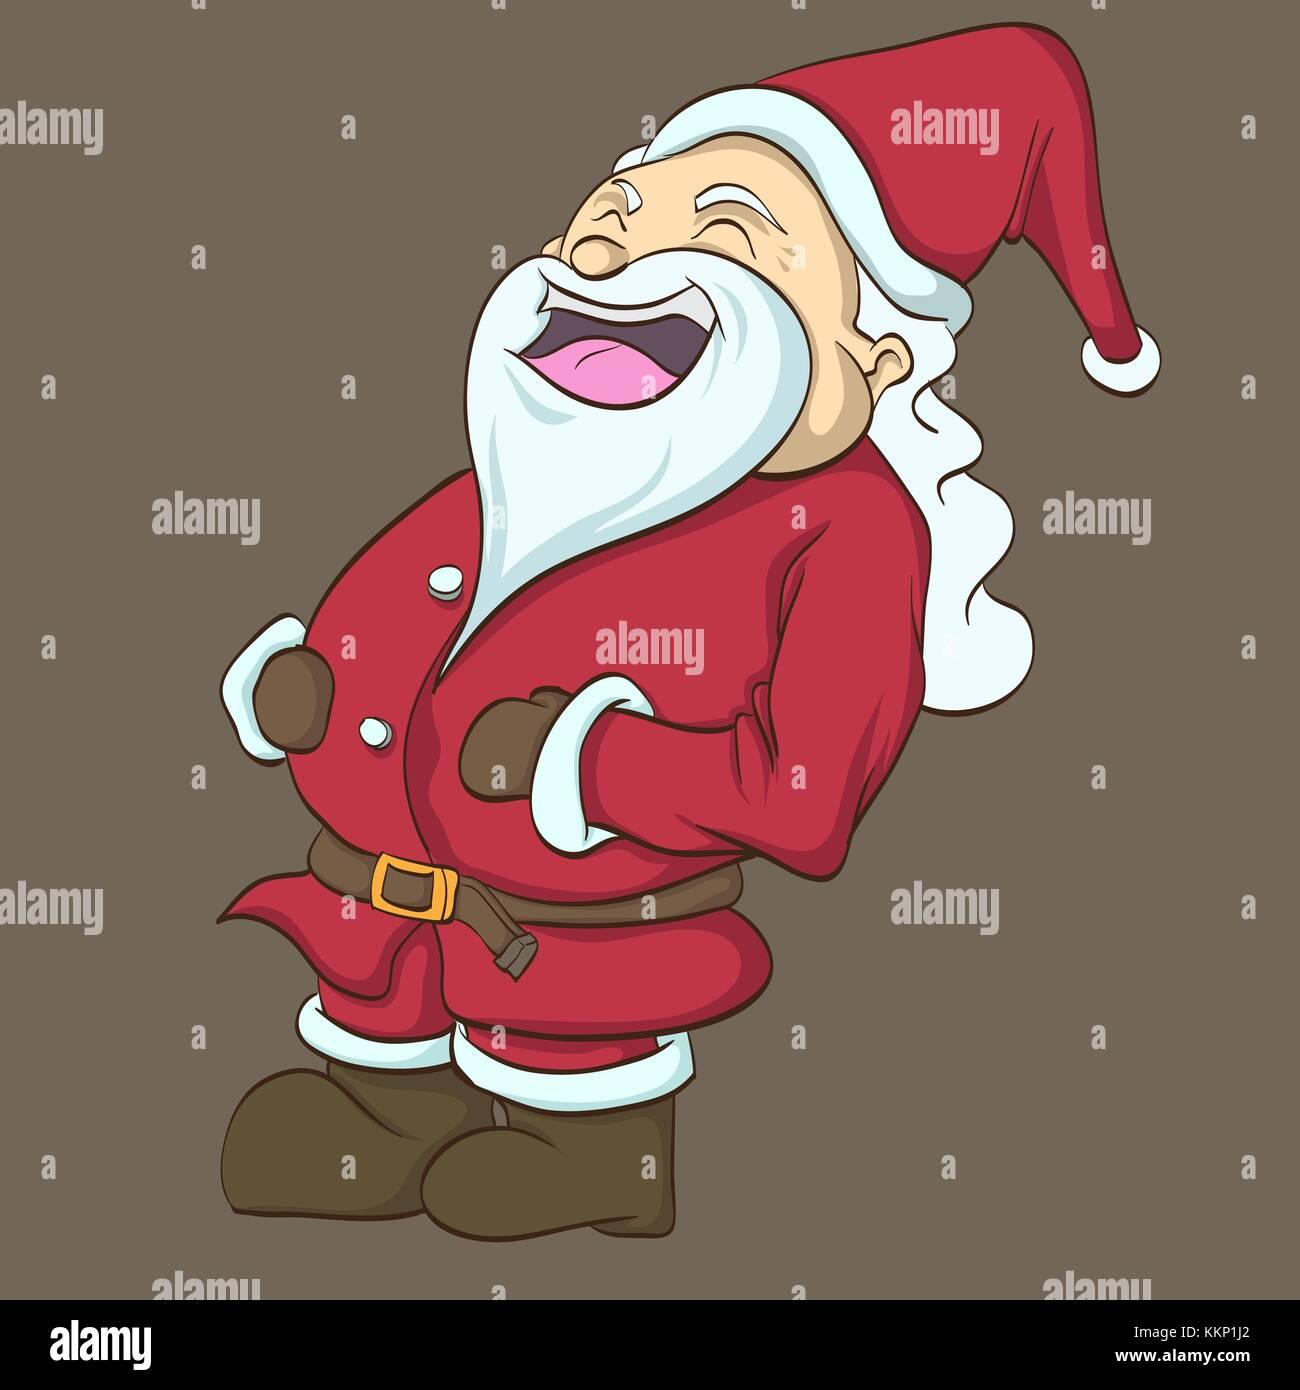 clip art of the happy santa - Stock Image